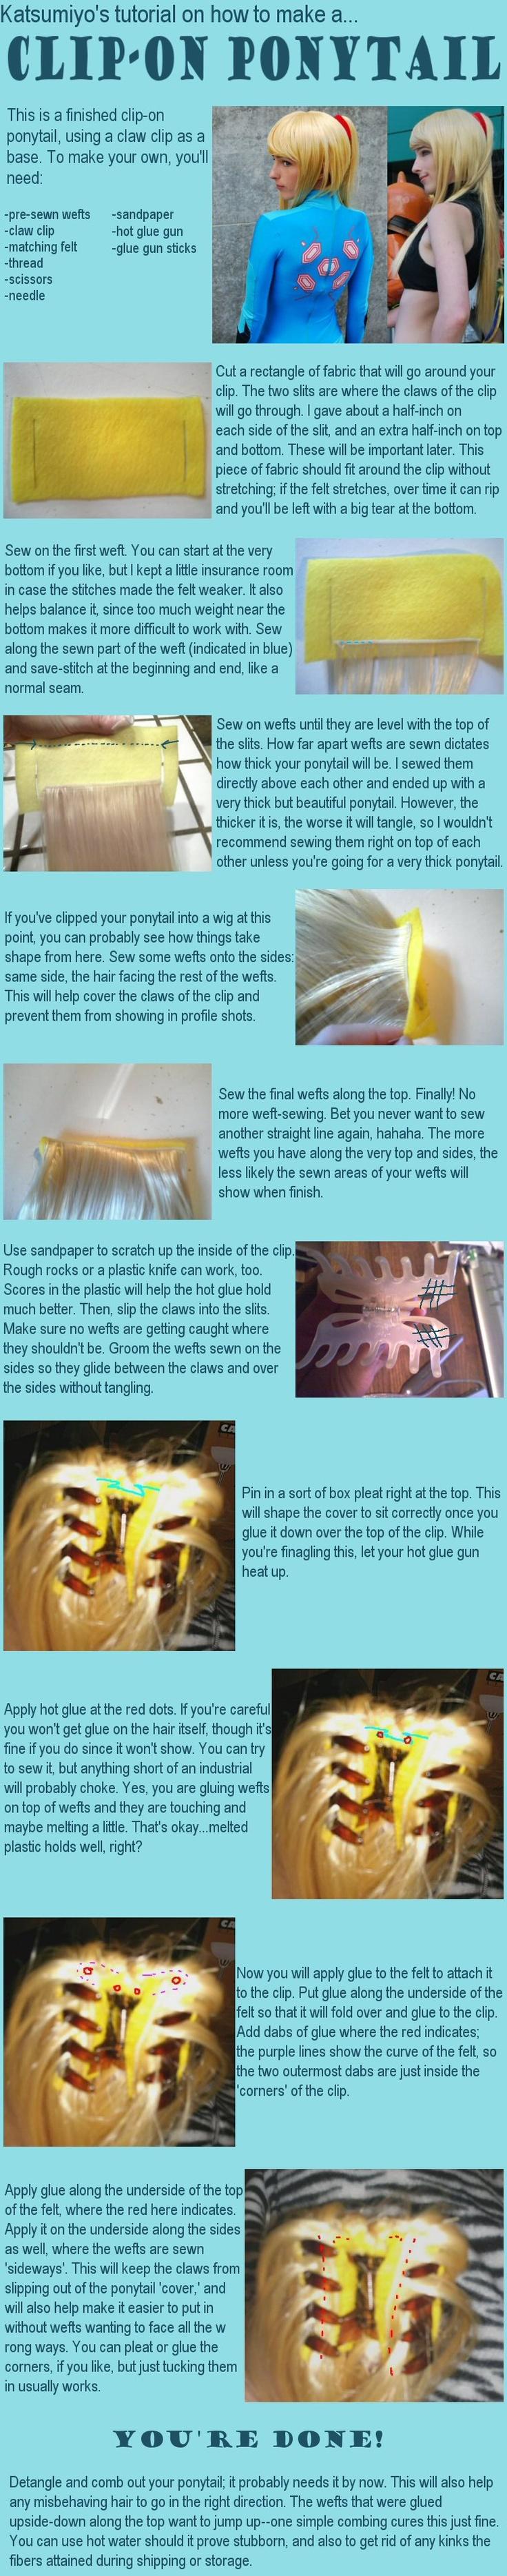 Ponytail hairclip tutorial!!!!! Diy Cosplay or not, i suppose, ponytail hairclip tutorial...